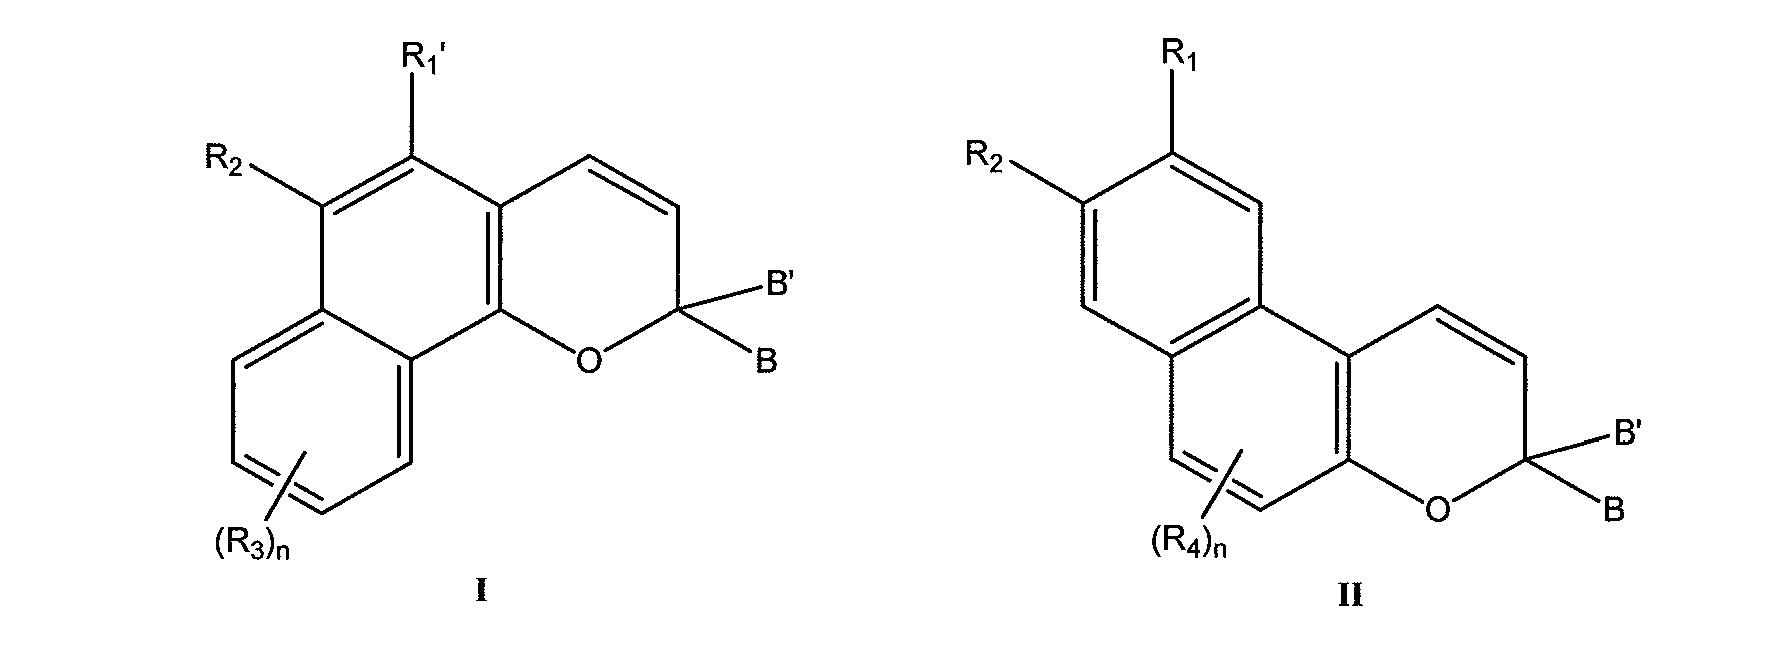 patent ep2270559a2